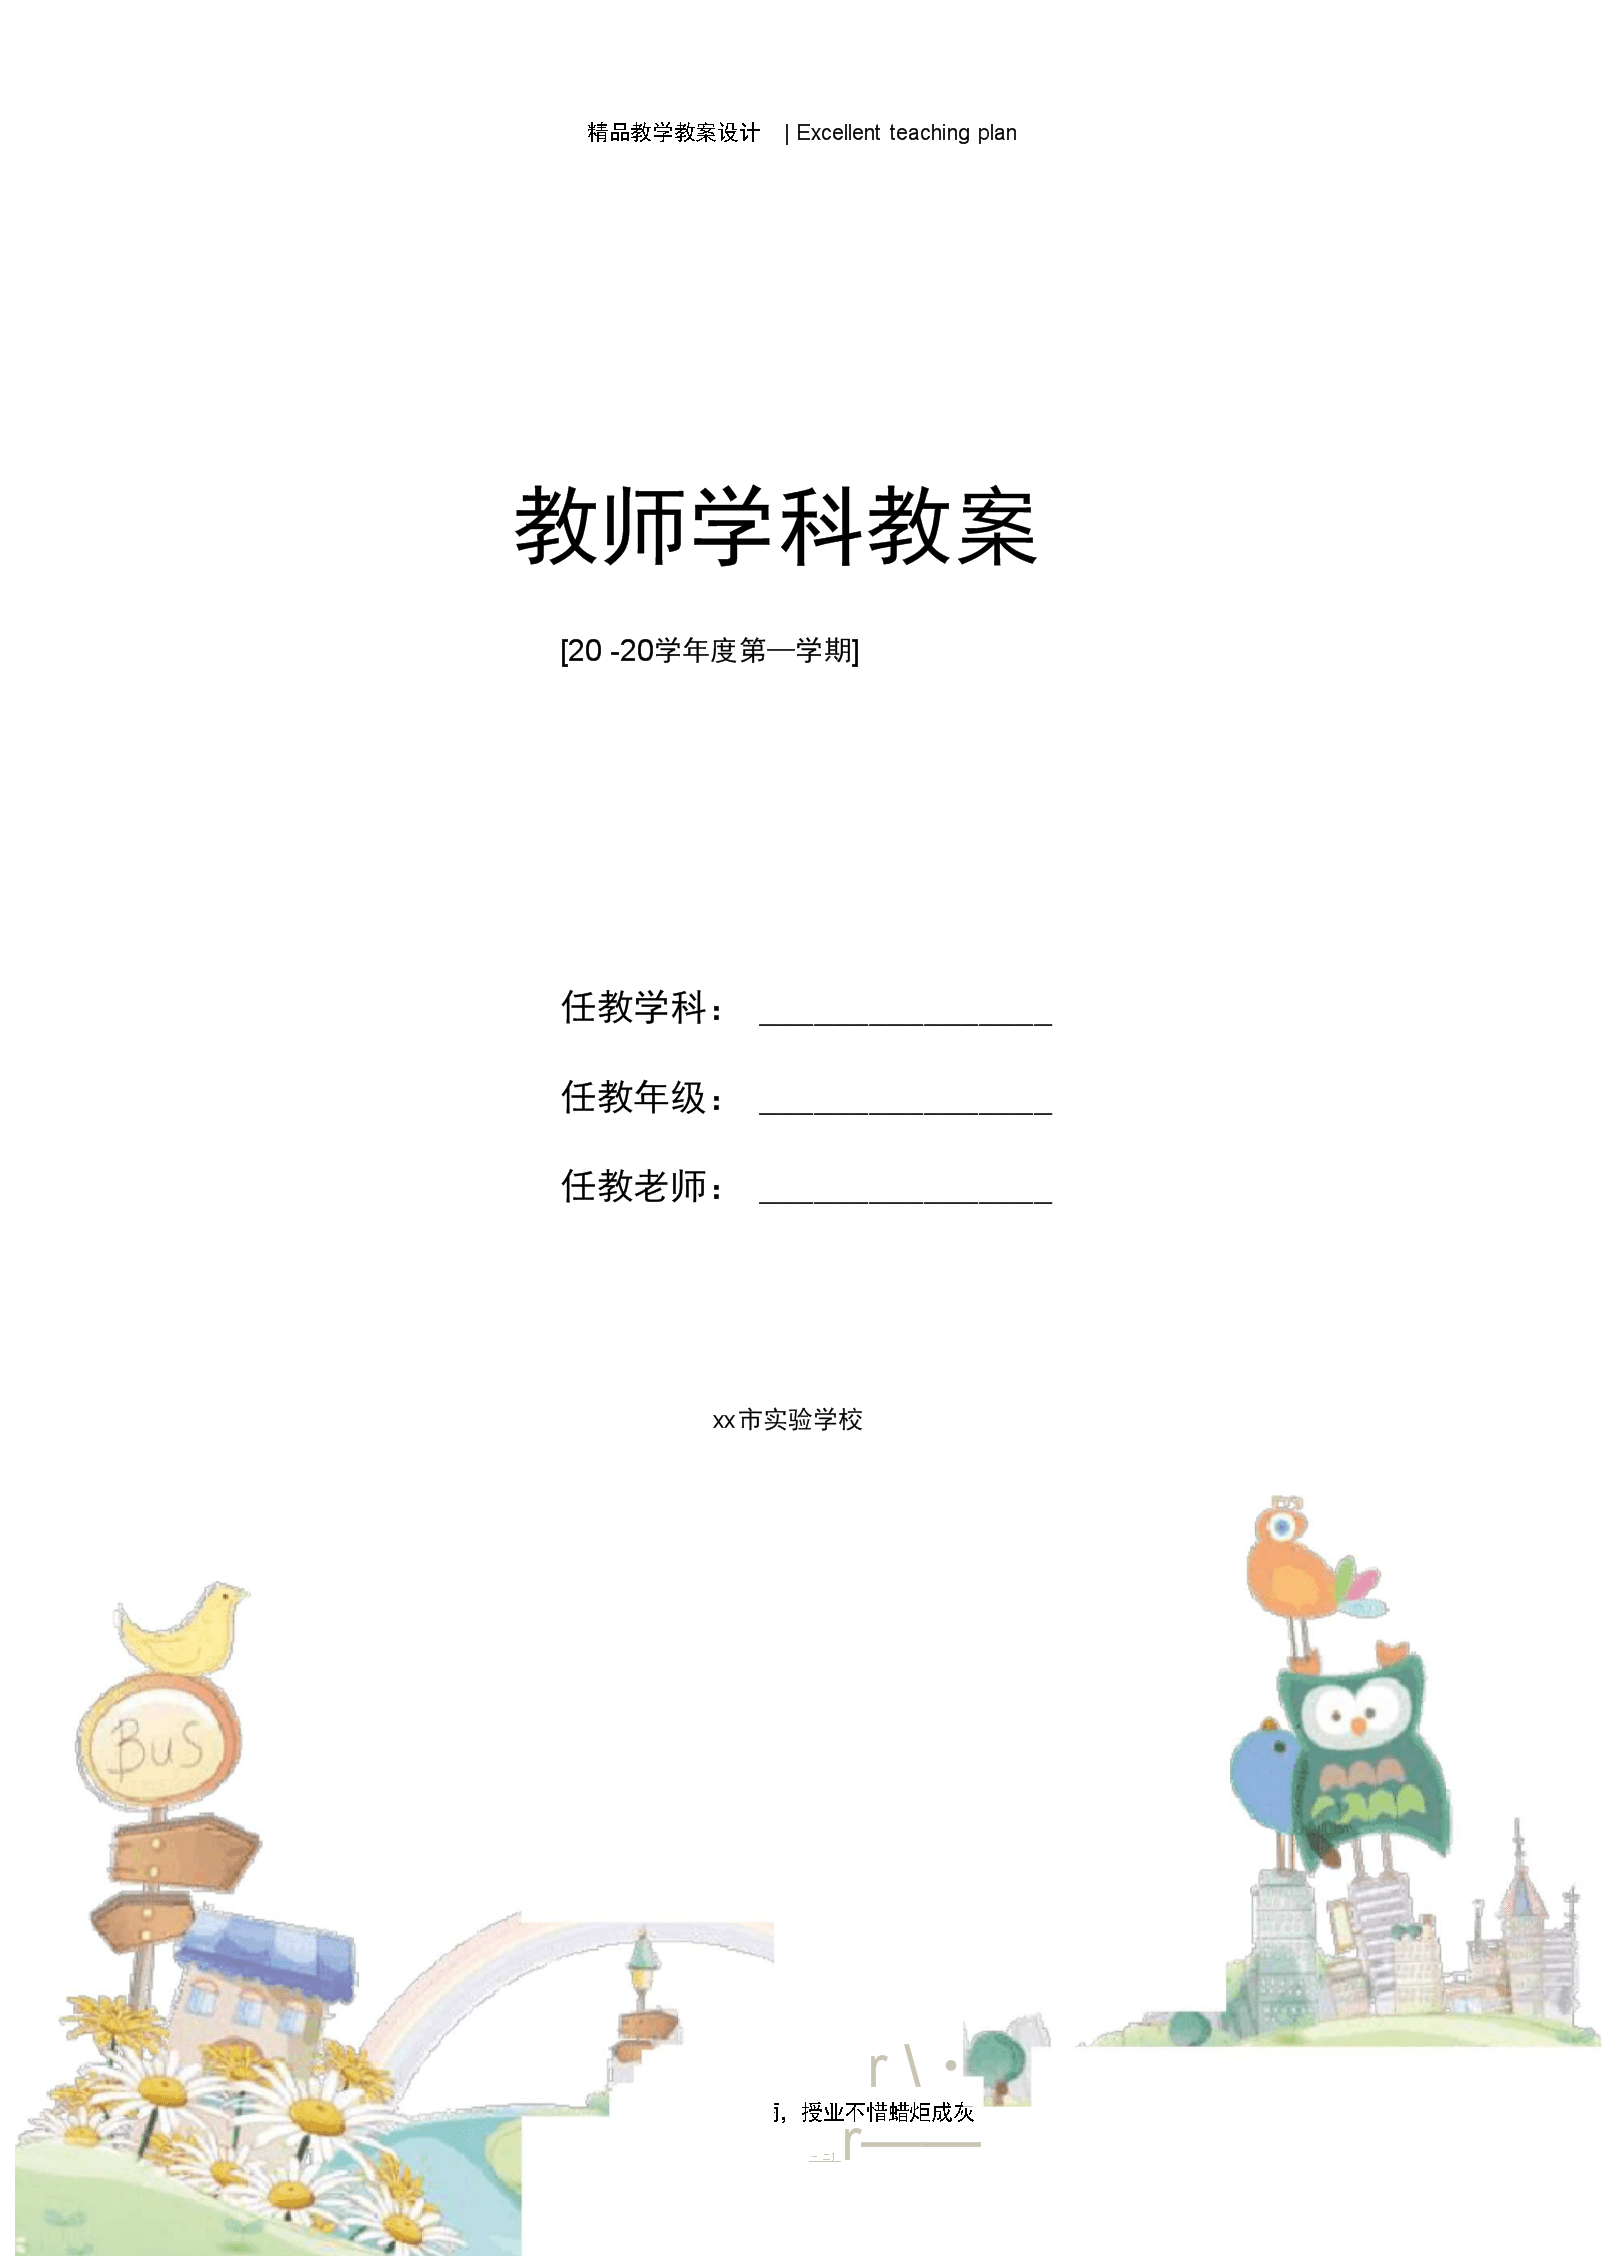 Unit3_第3课时名师教案新部编本.docx